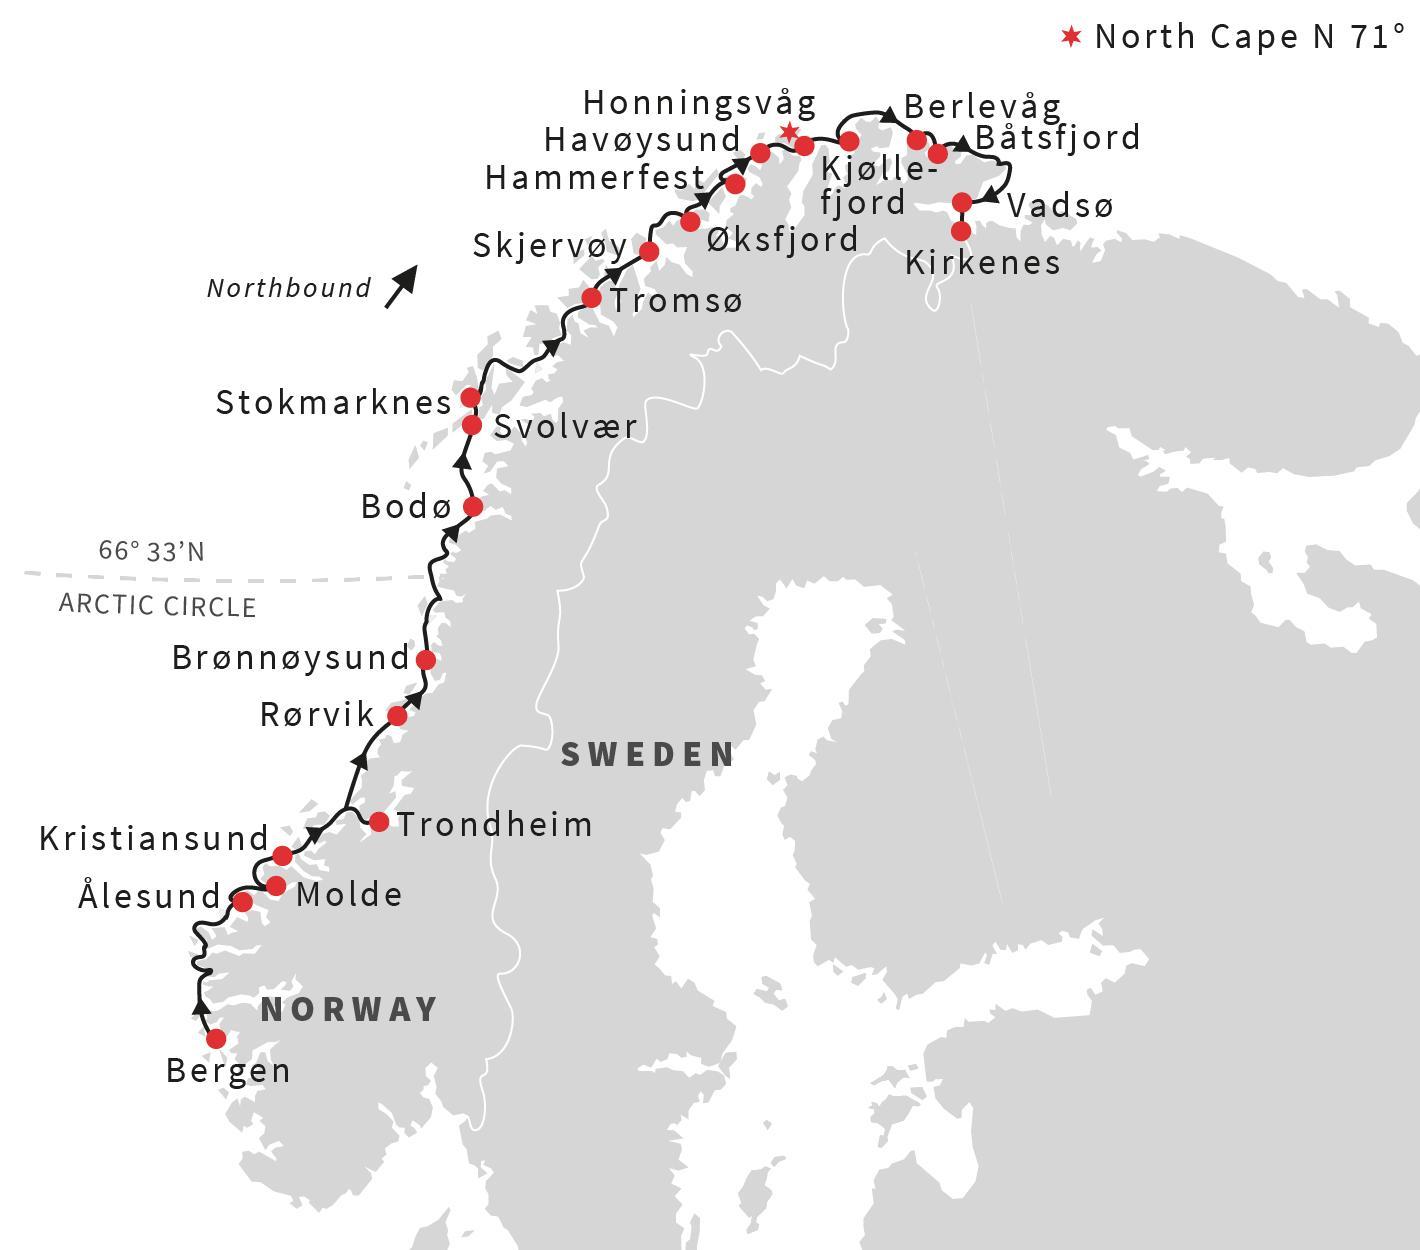 Bergen Norge Light Rail Kart Kart Over Bergen Norge Light Rail